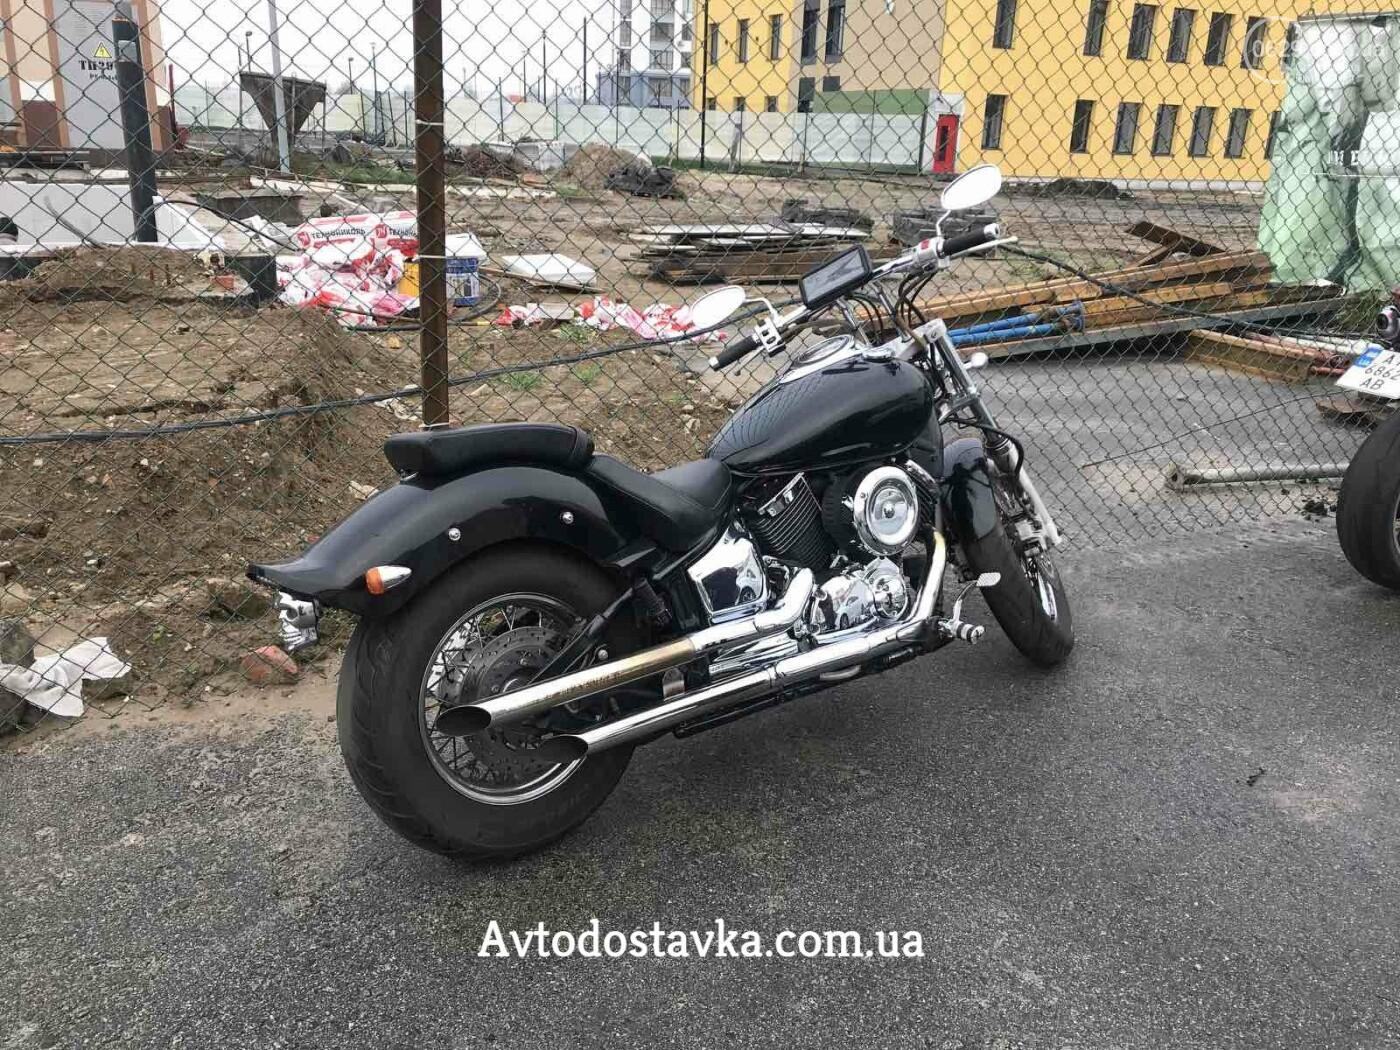 Перевозка мотоцикла по Украине - Автодоставка, фото-3